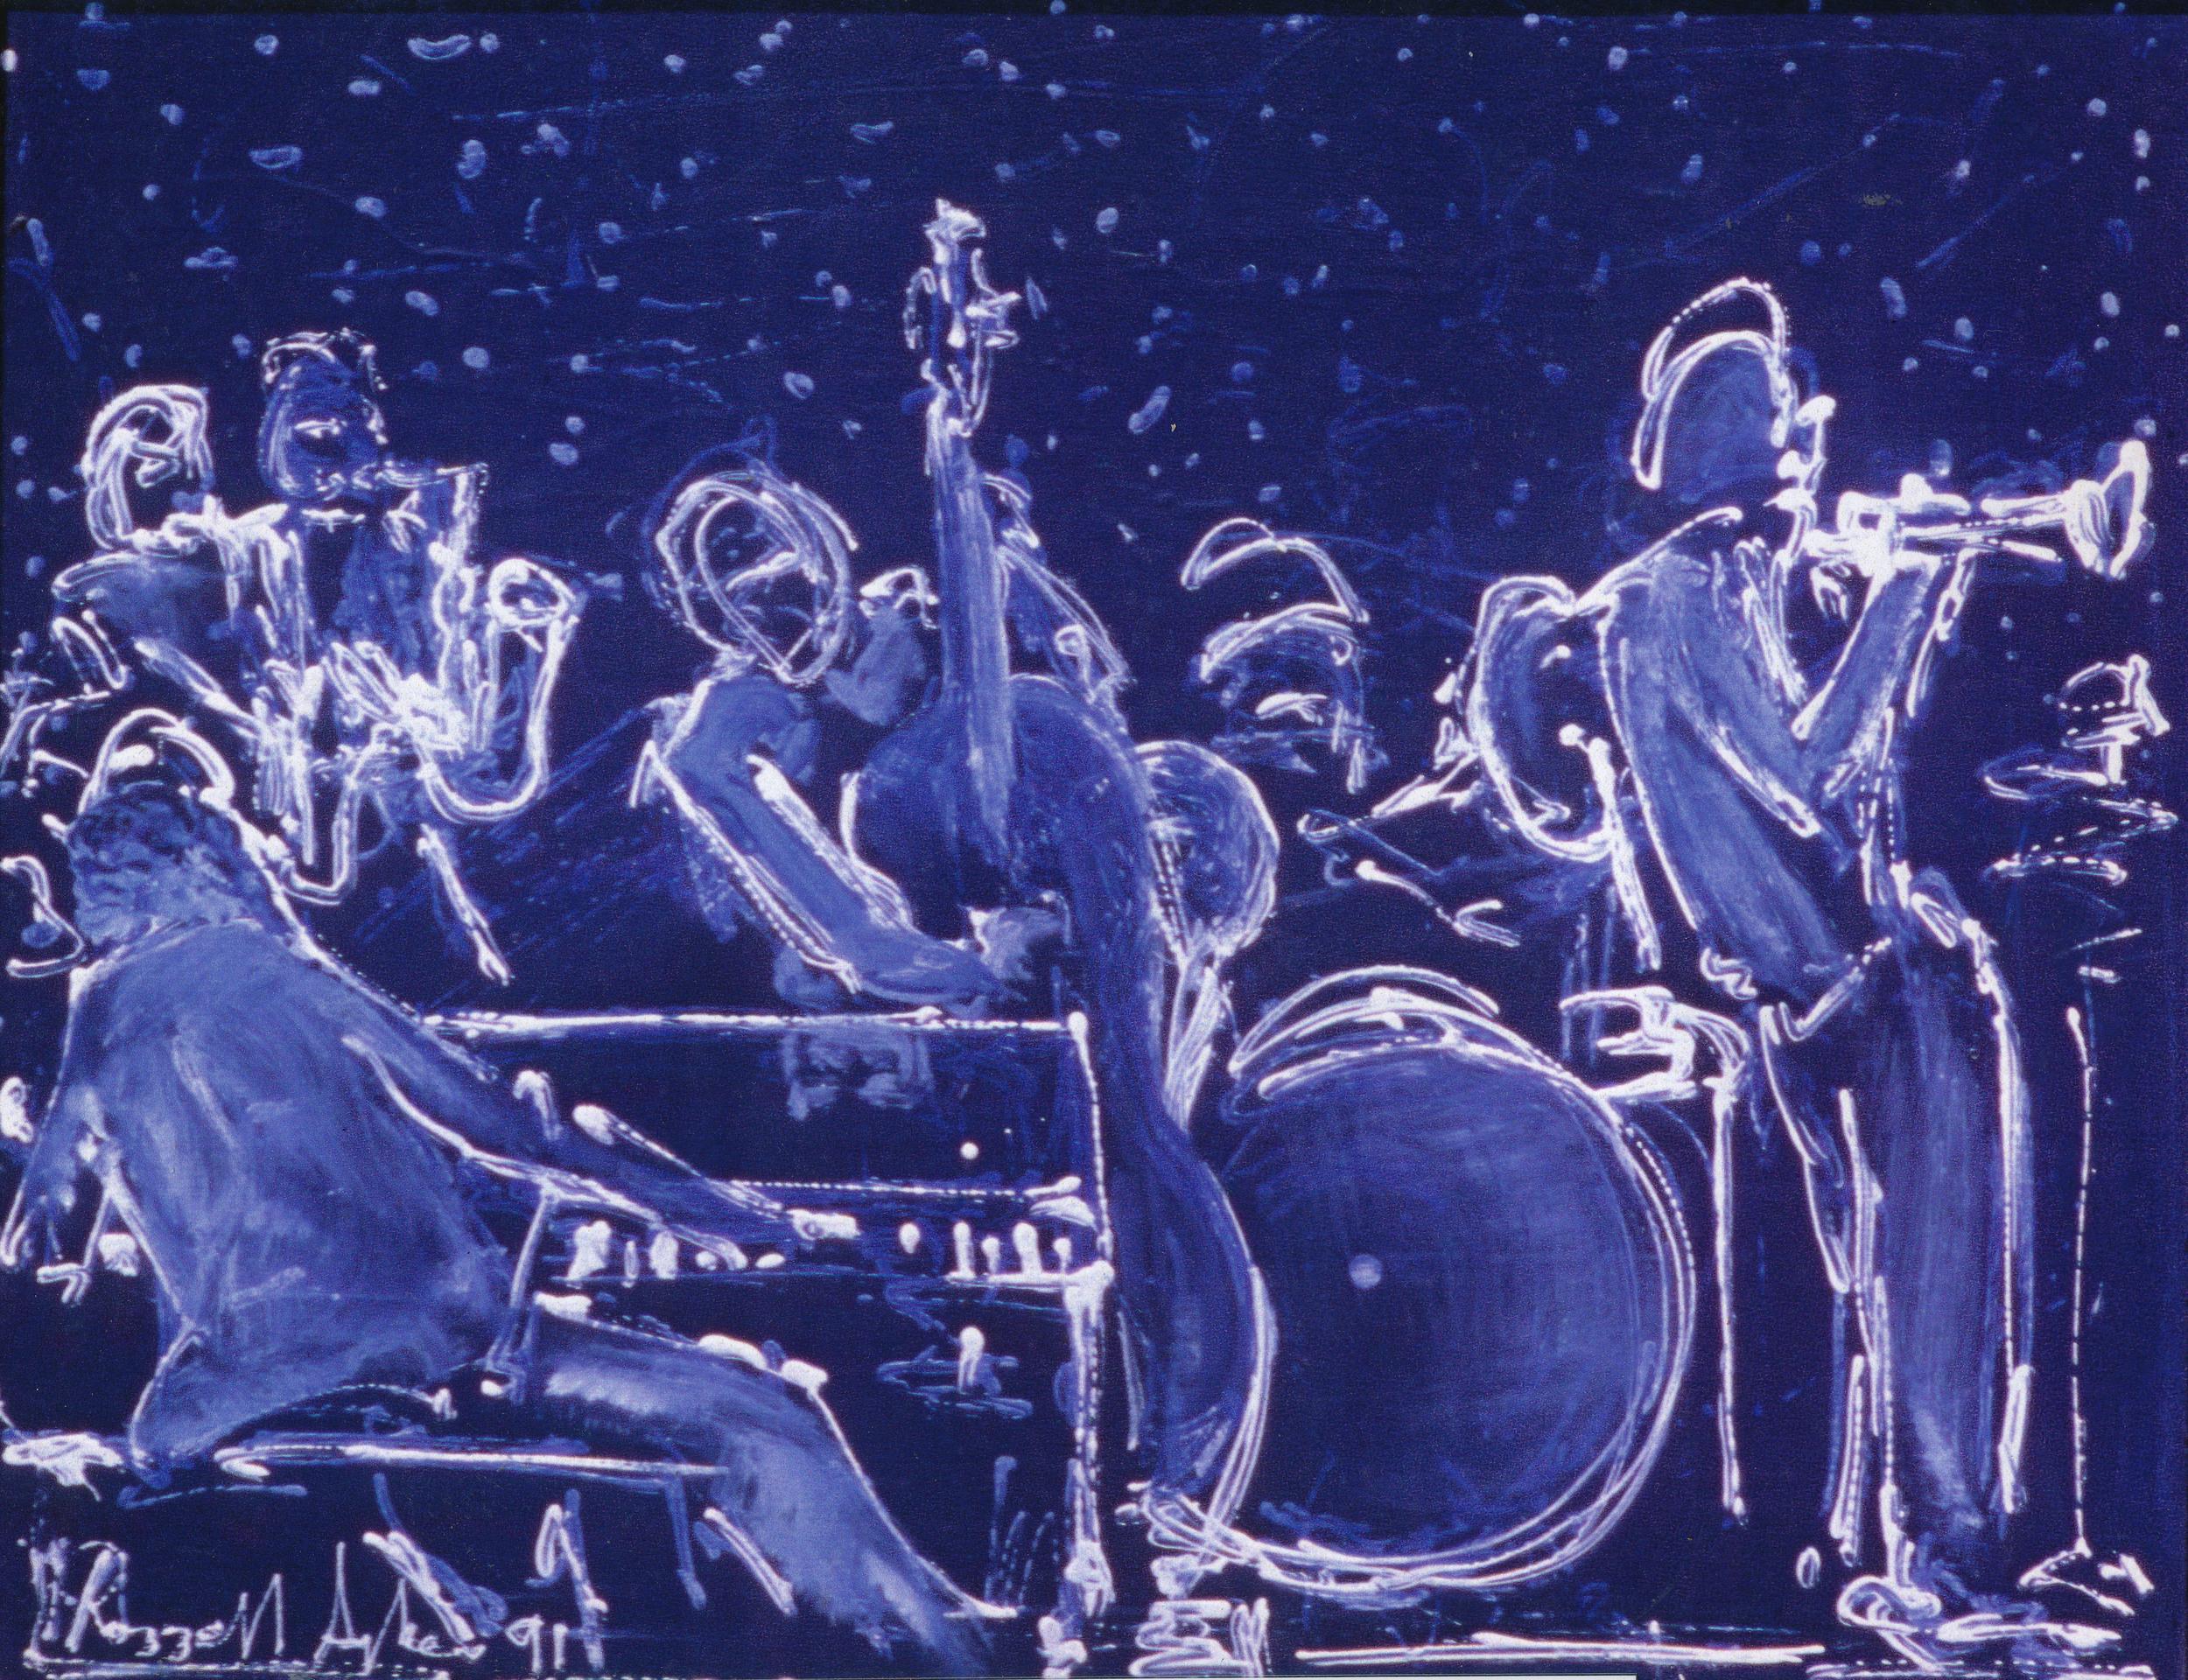 Midnight Blues, 1991